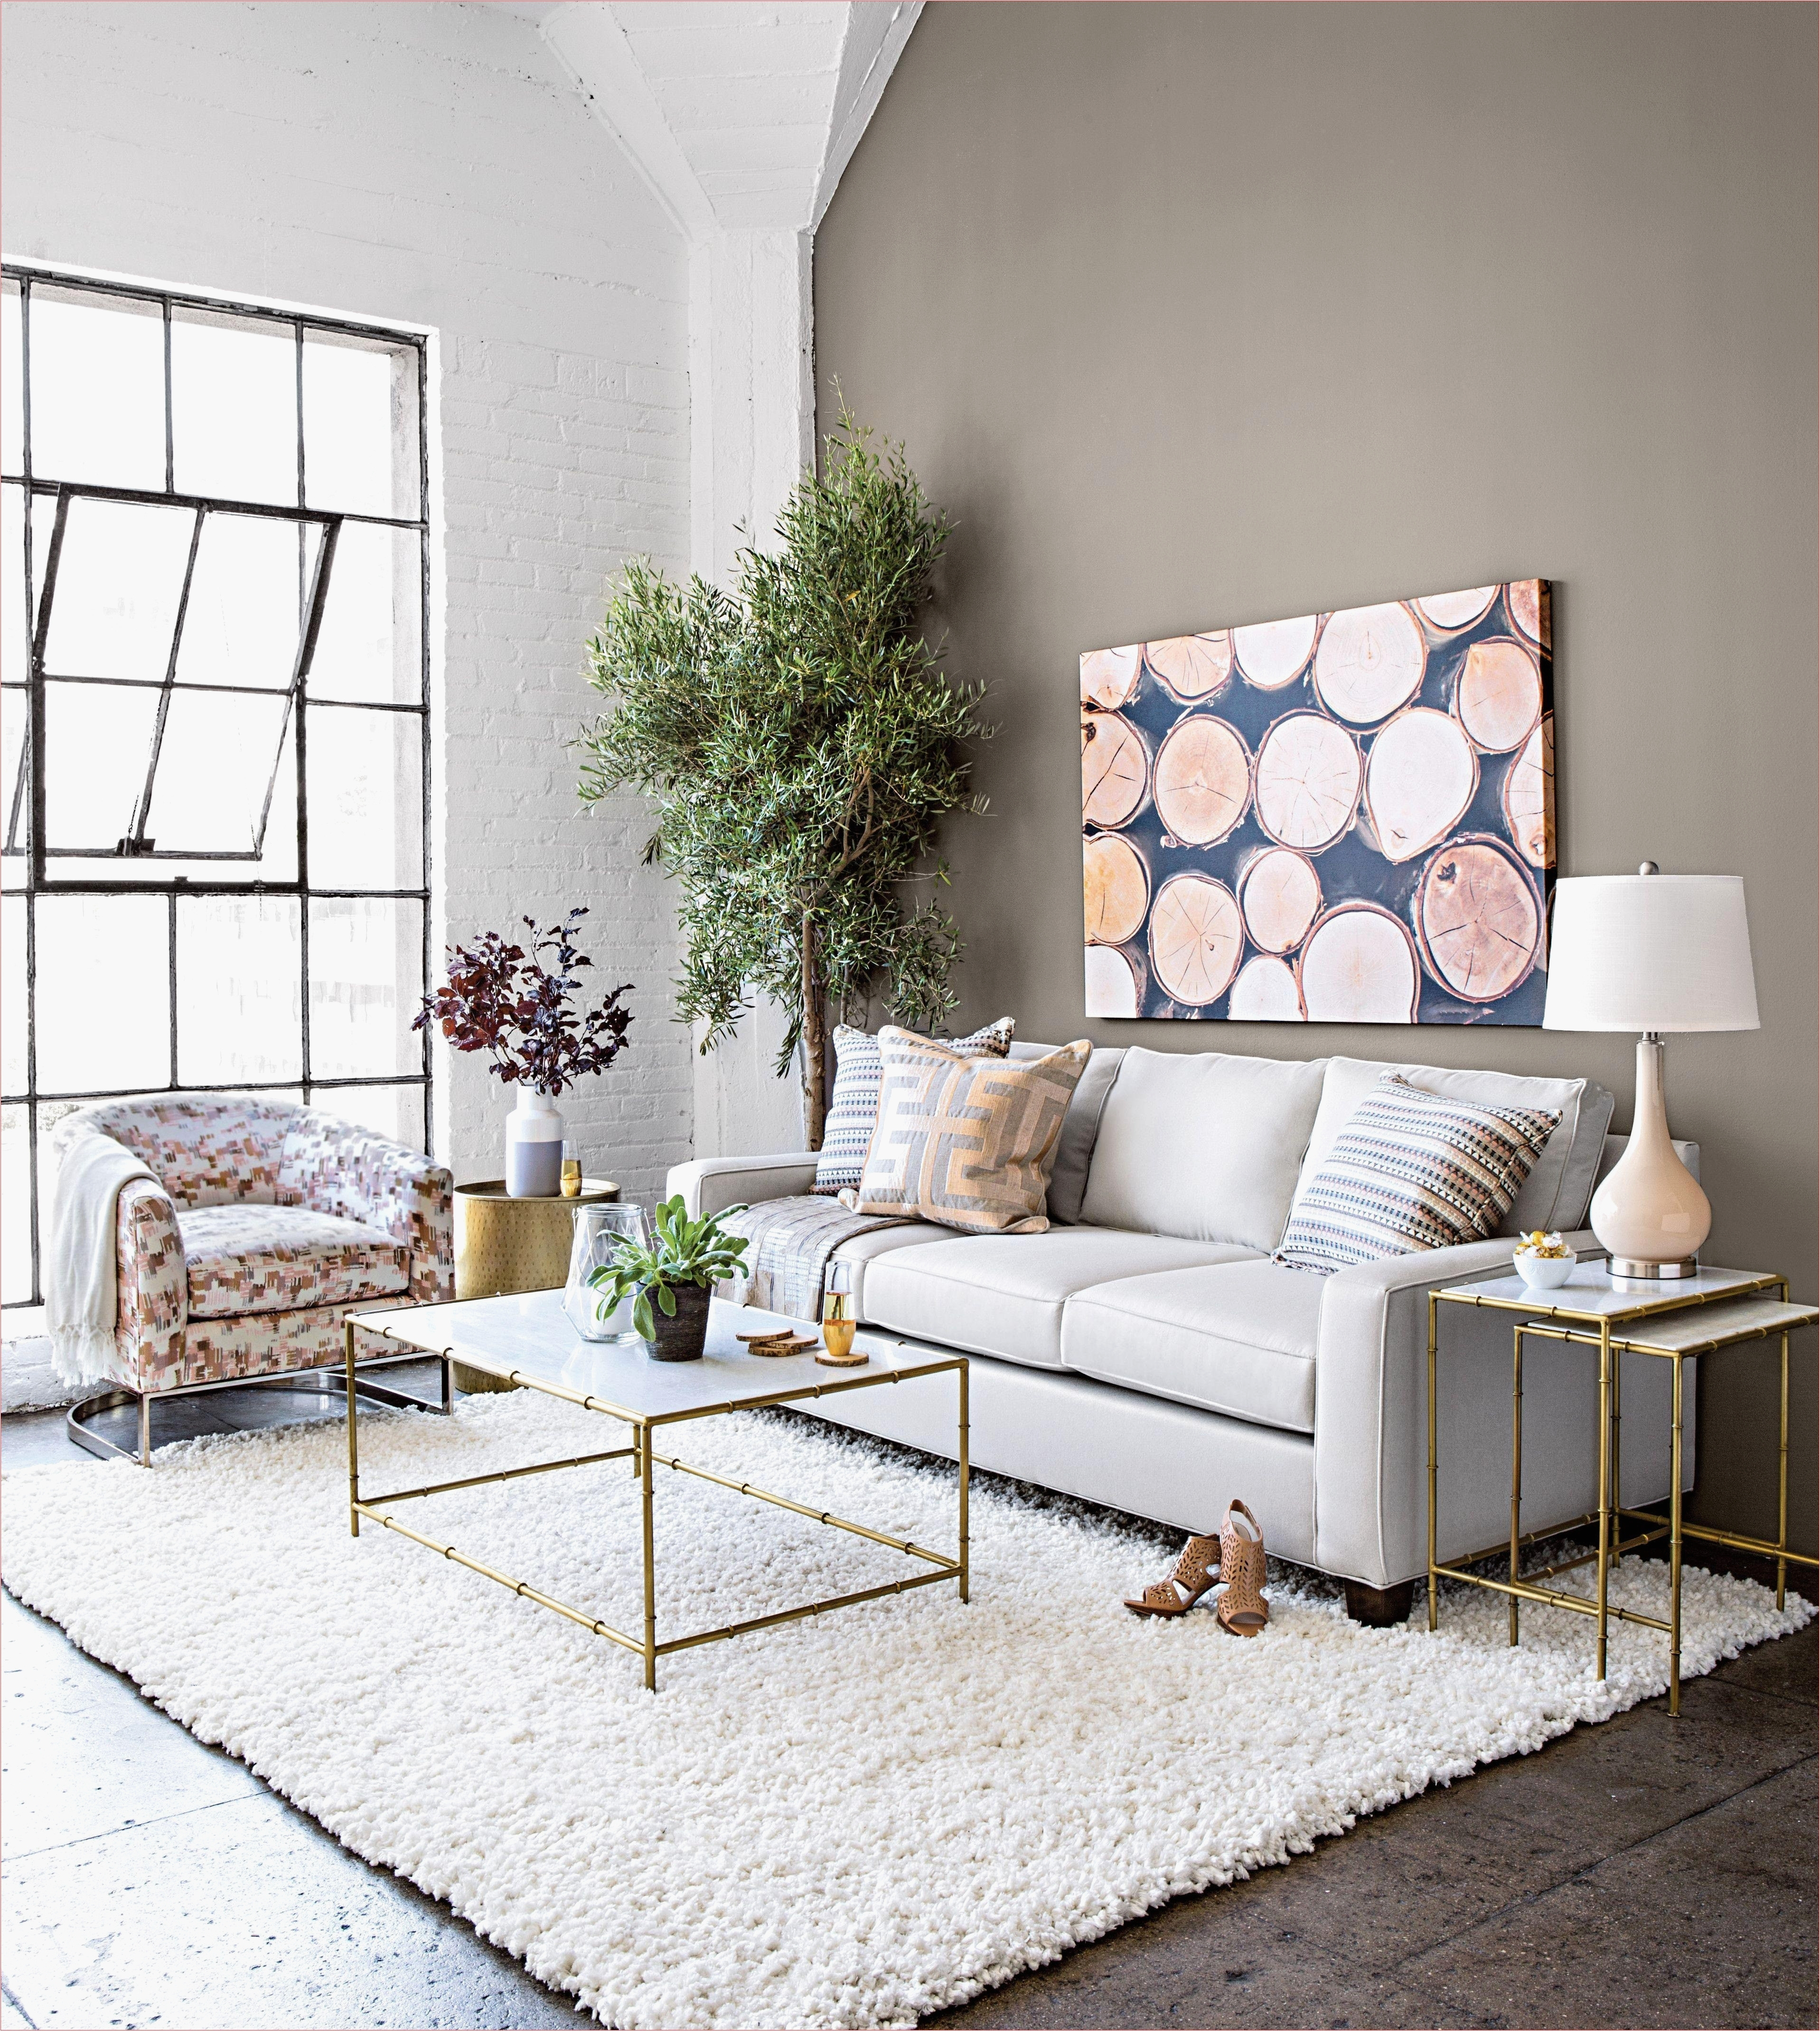 express furniture warehouse queens new luxury american furniture warehouse futon beautiful pics of express furniture